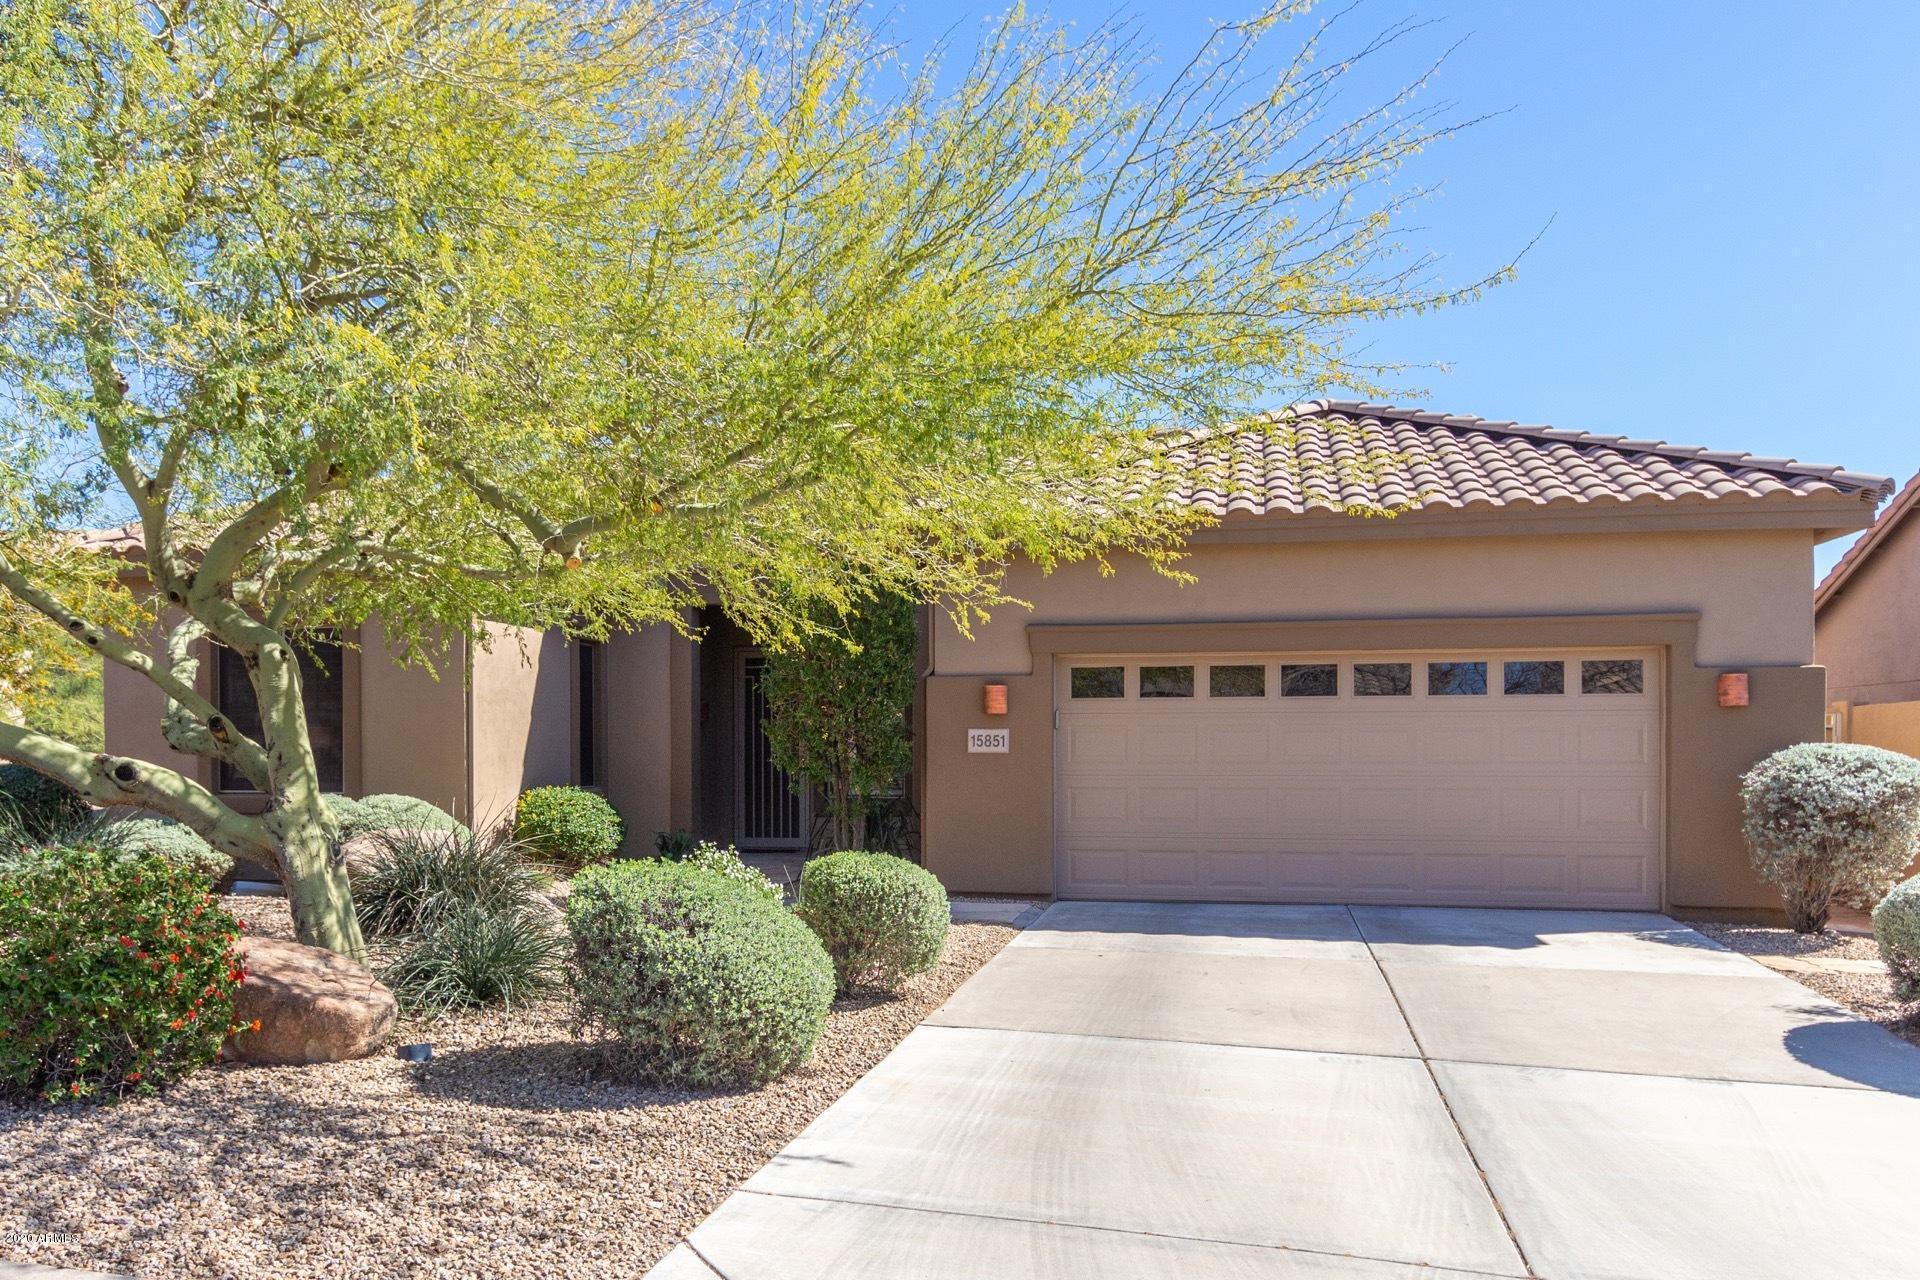 Photo of 15851 N 107TH Place, Scottsdale, AZ 85255